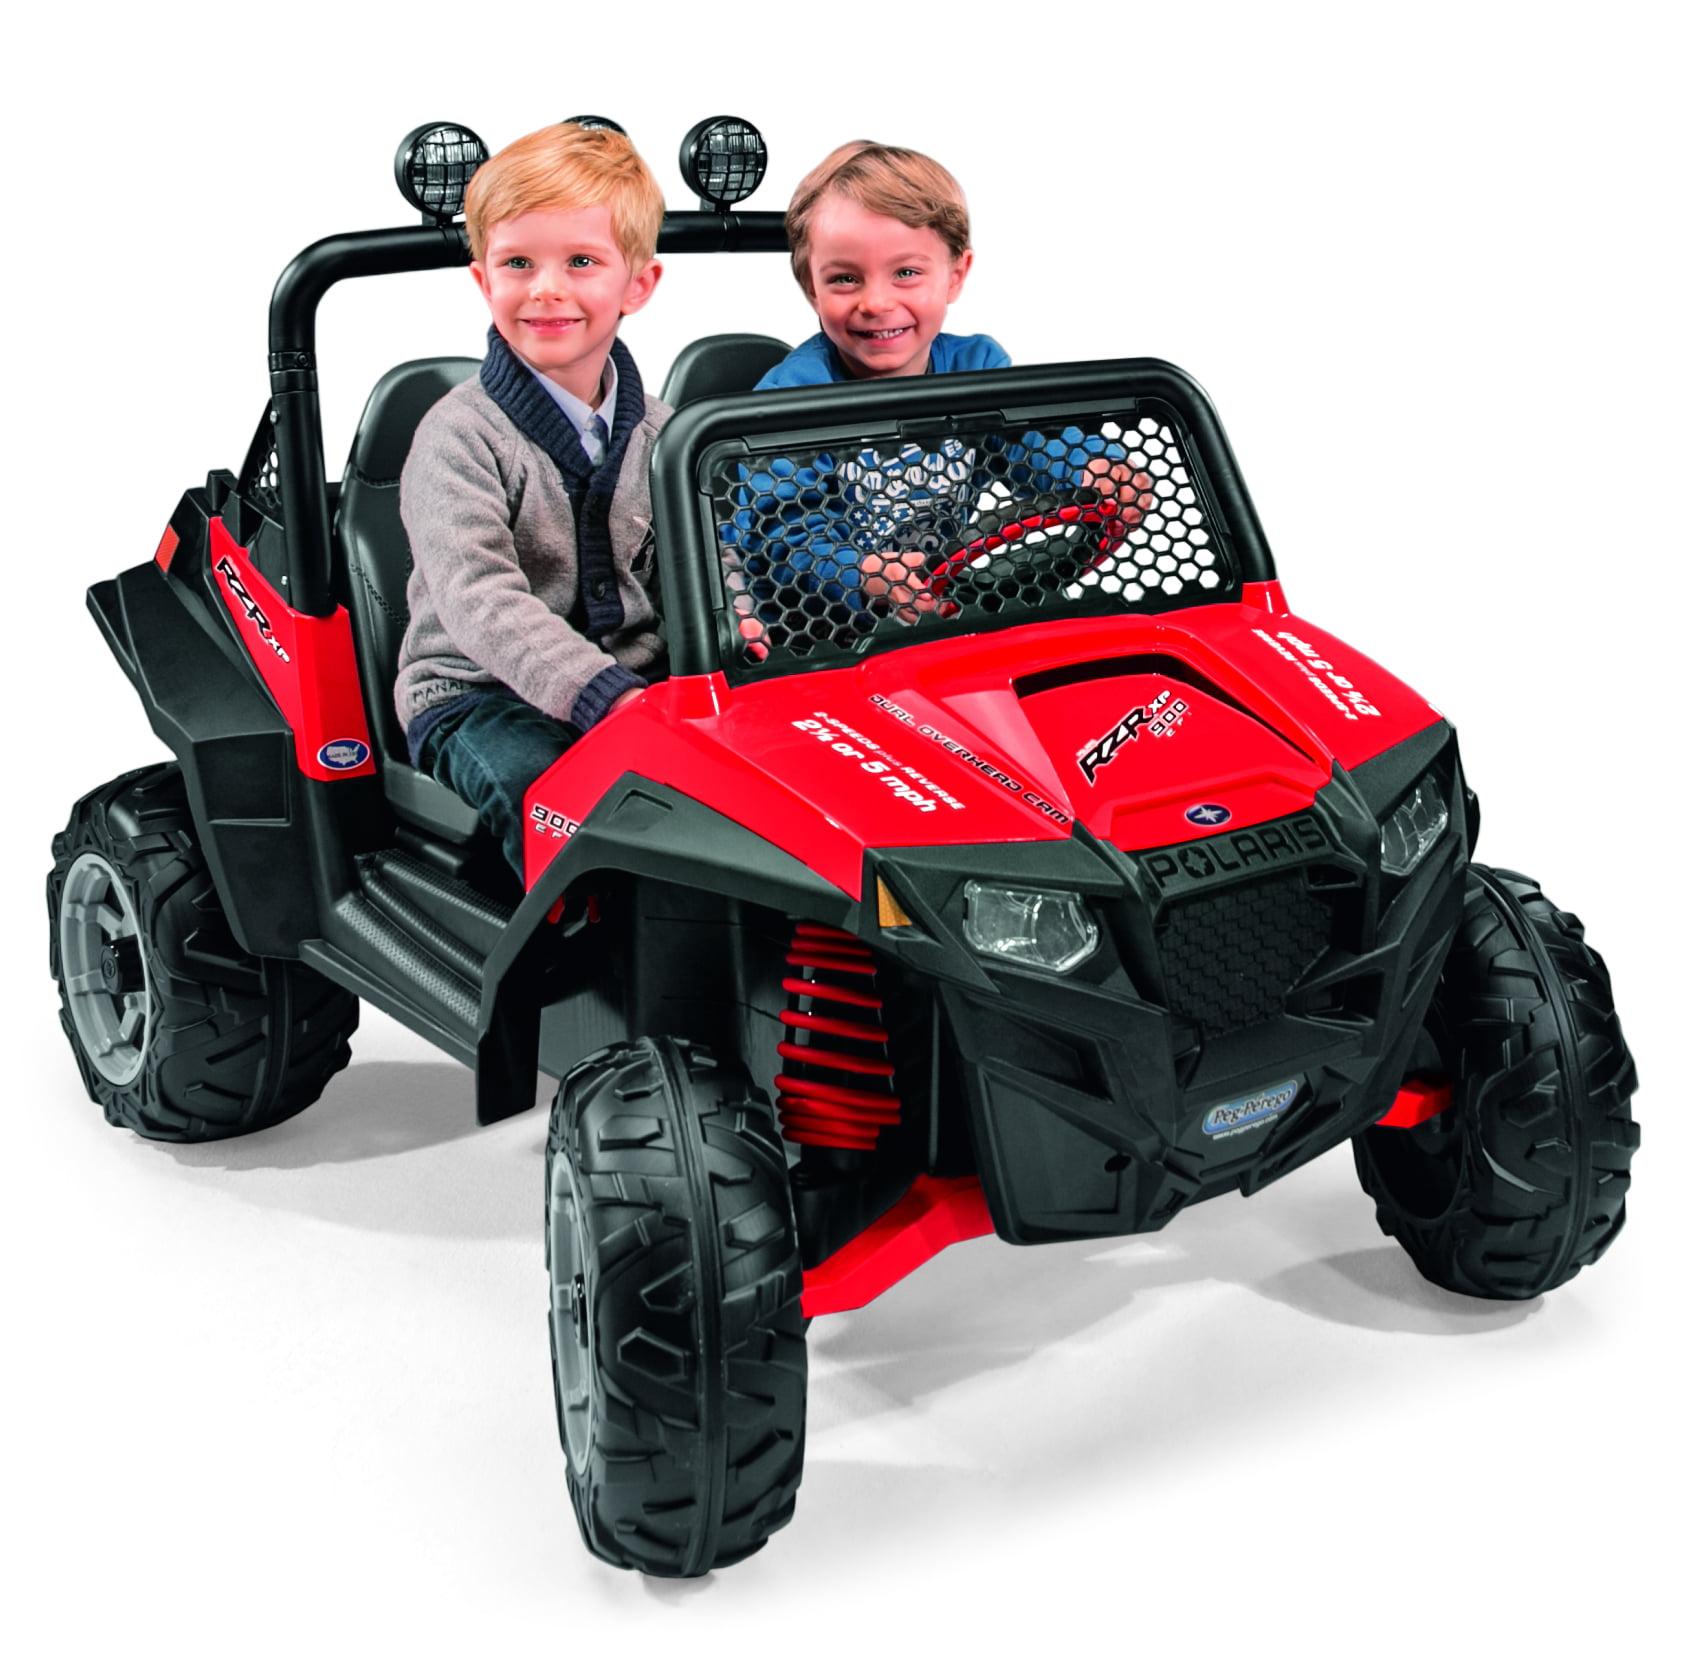 Peg Perego Polaris Ranger RZR 900 12-Volt Battery-Powered Ride-On, Red